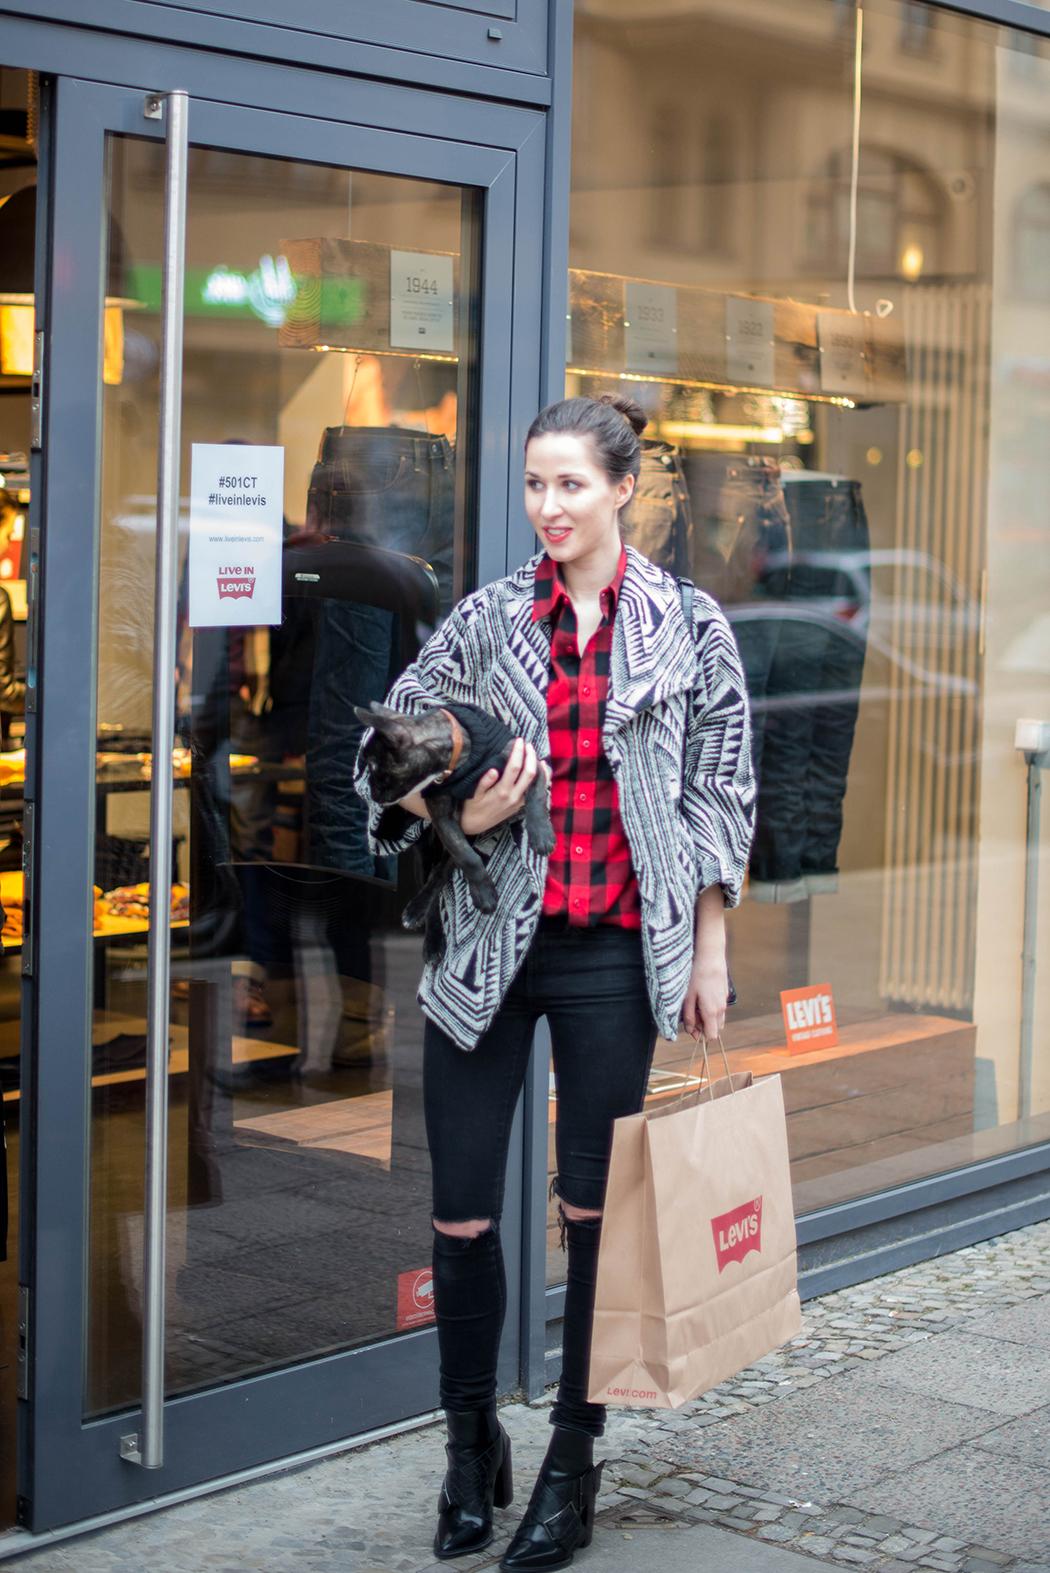 Levis-501-Berlin-Fashionblog-Deutschland-München-Fashionblogger-Bloggerevent-Lindarella-10